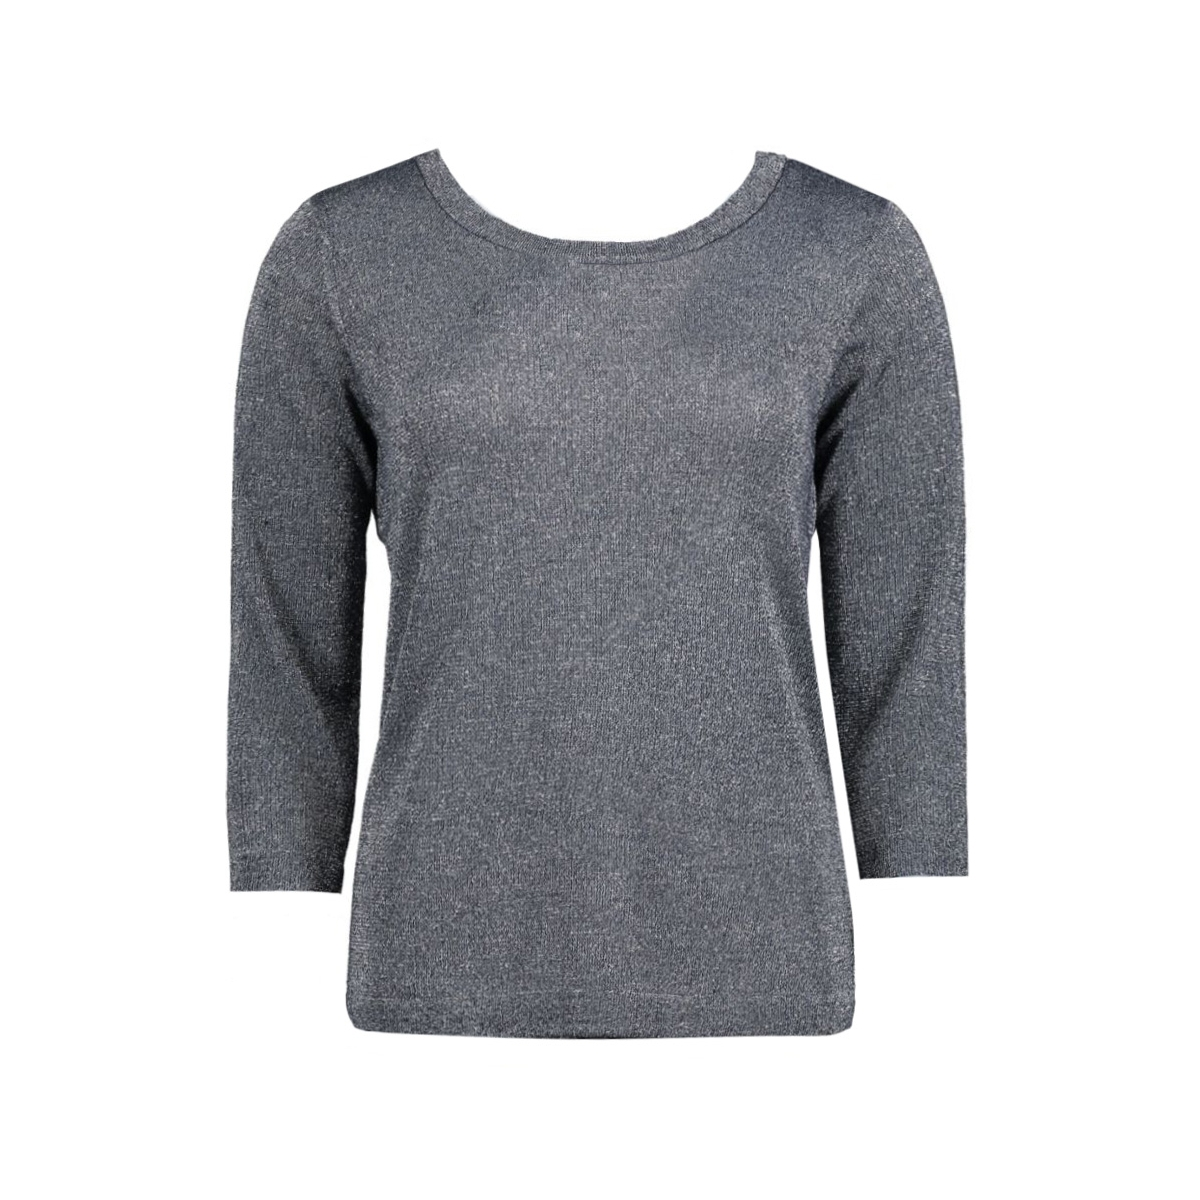 objbrooklyn 3/4 knit top 23023500 object t-shirt sky captain